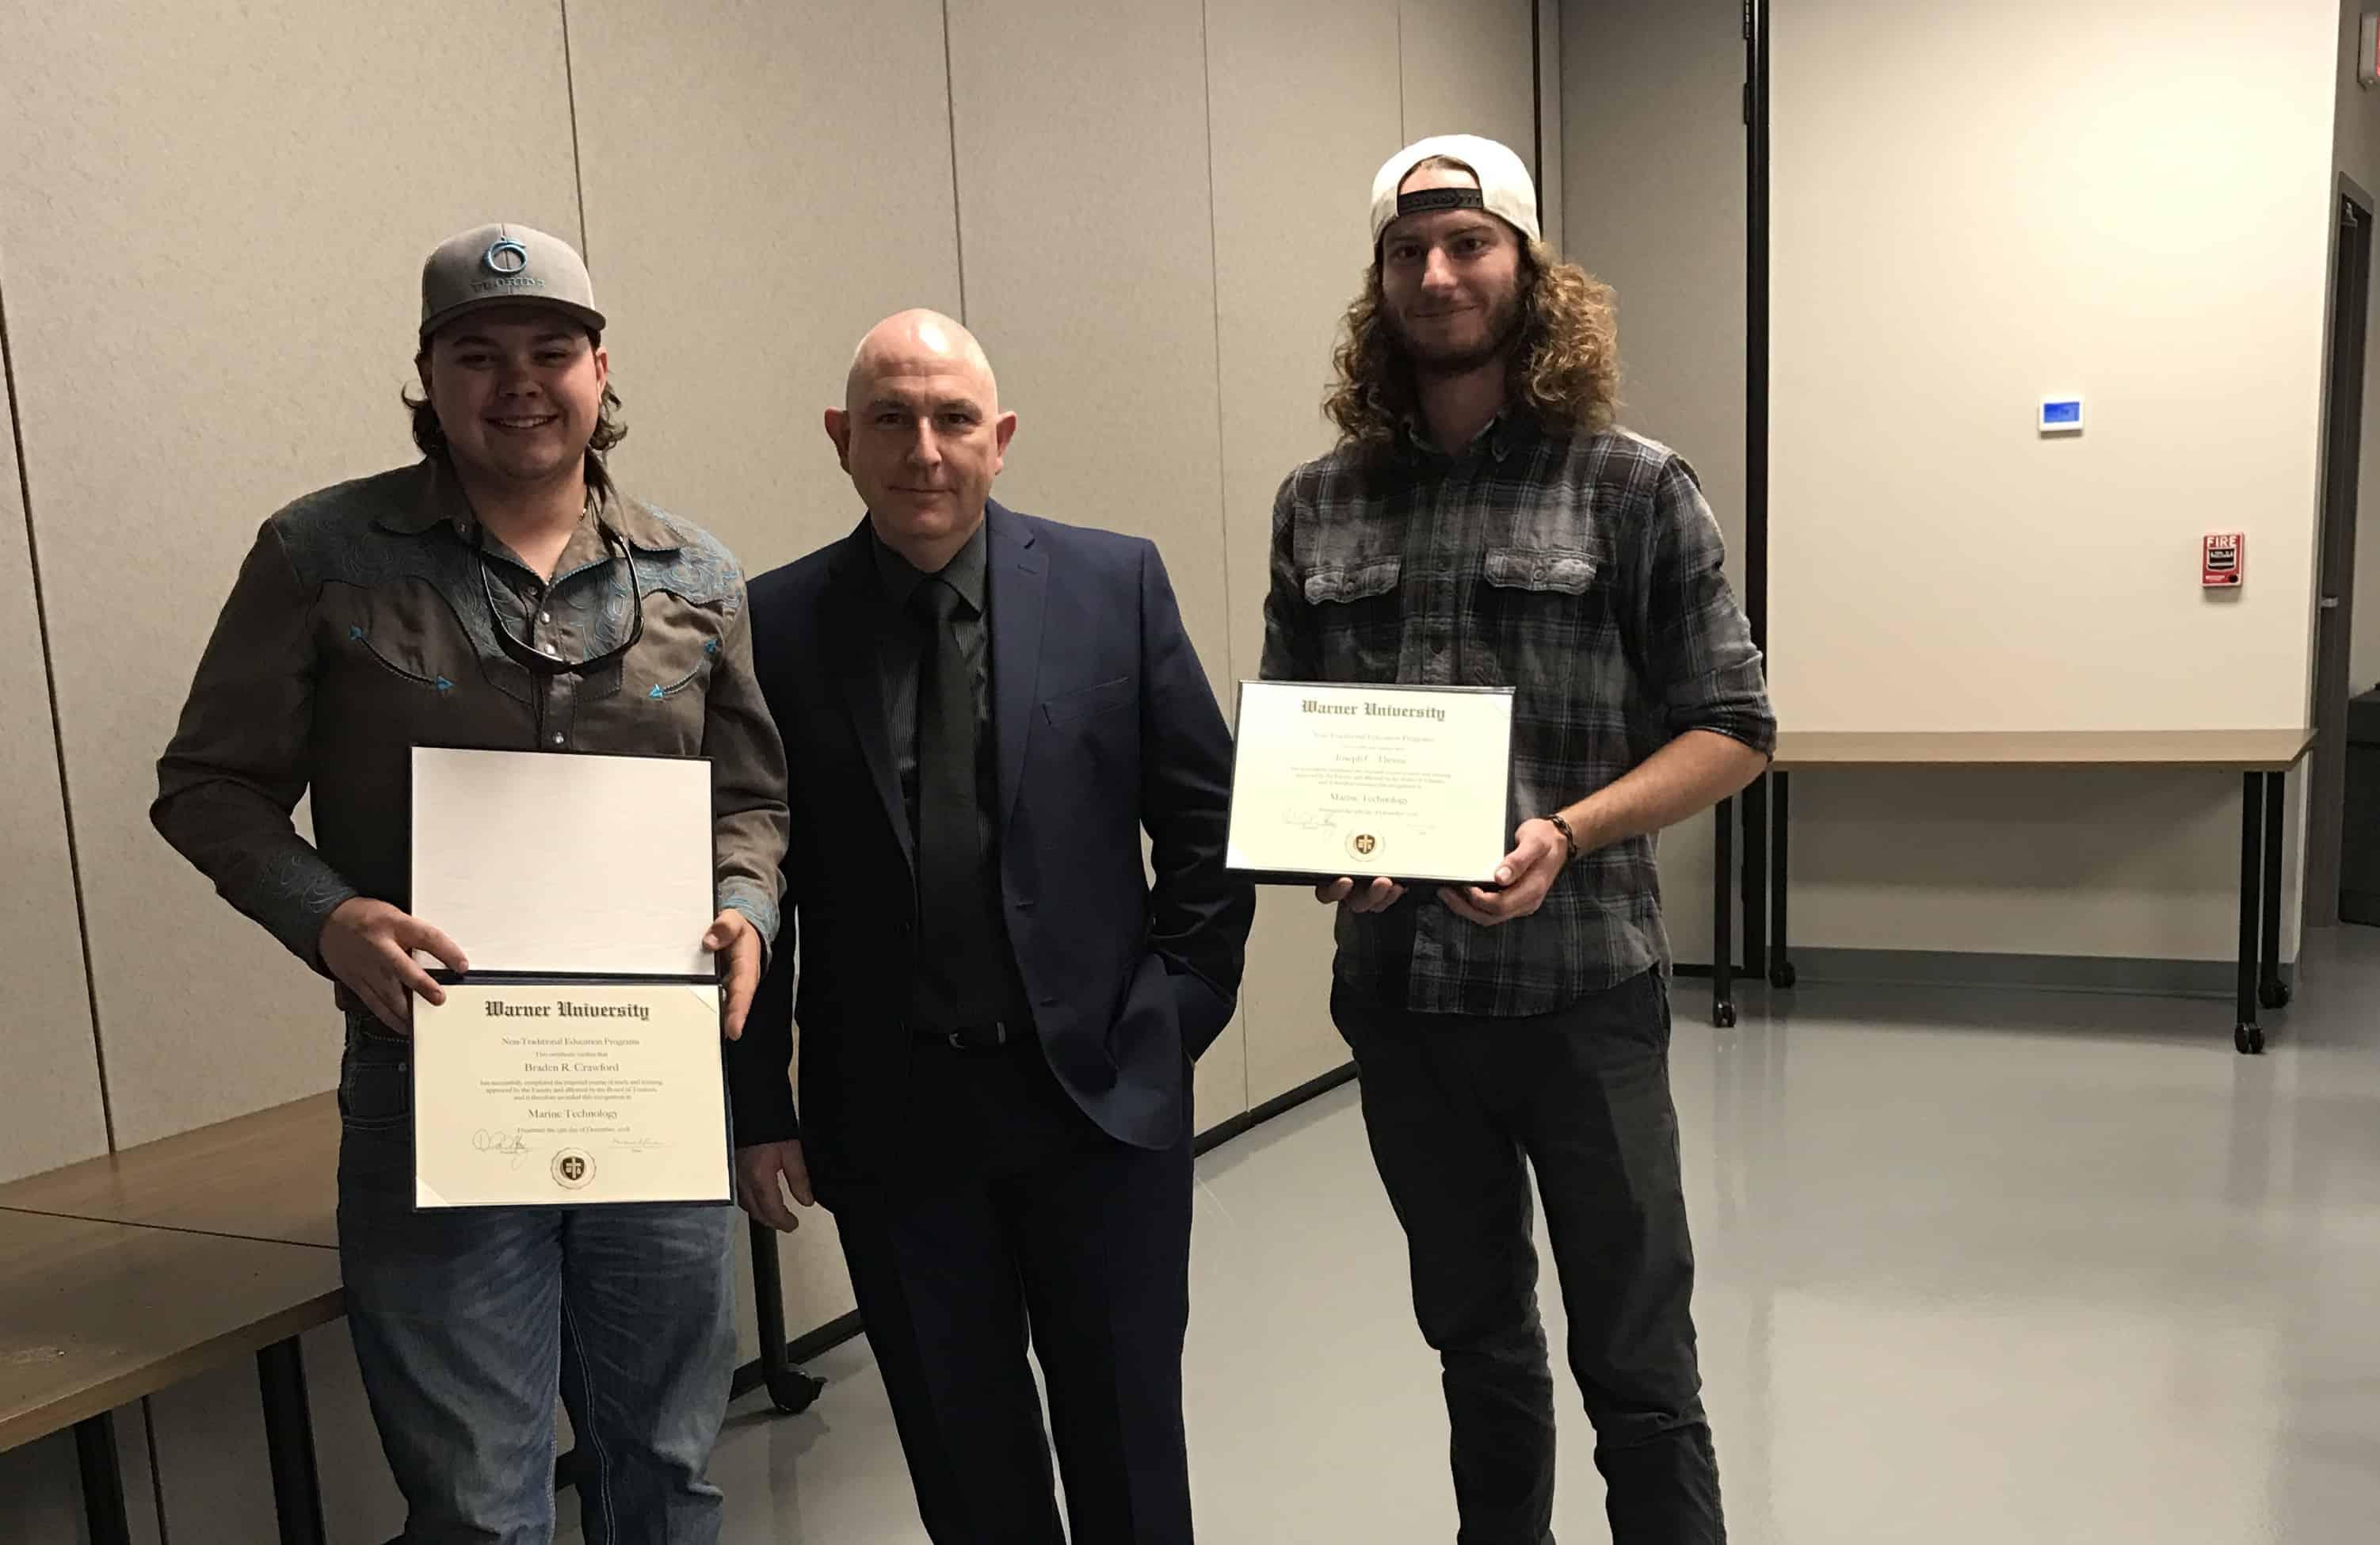 Congratulations New Marine Graduates!